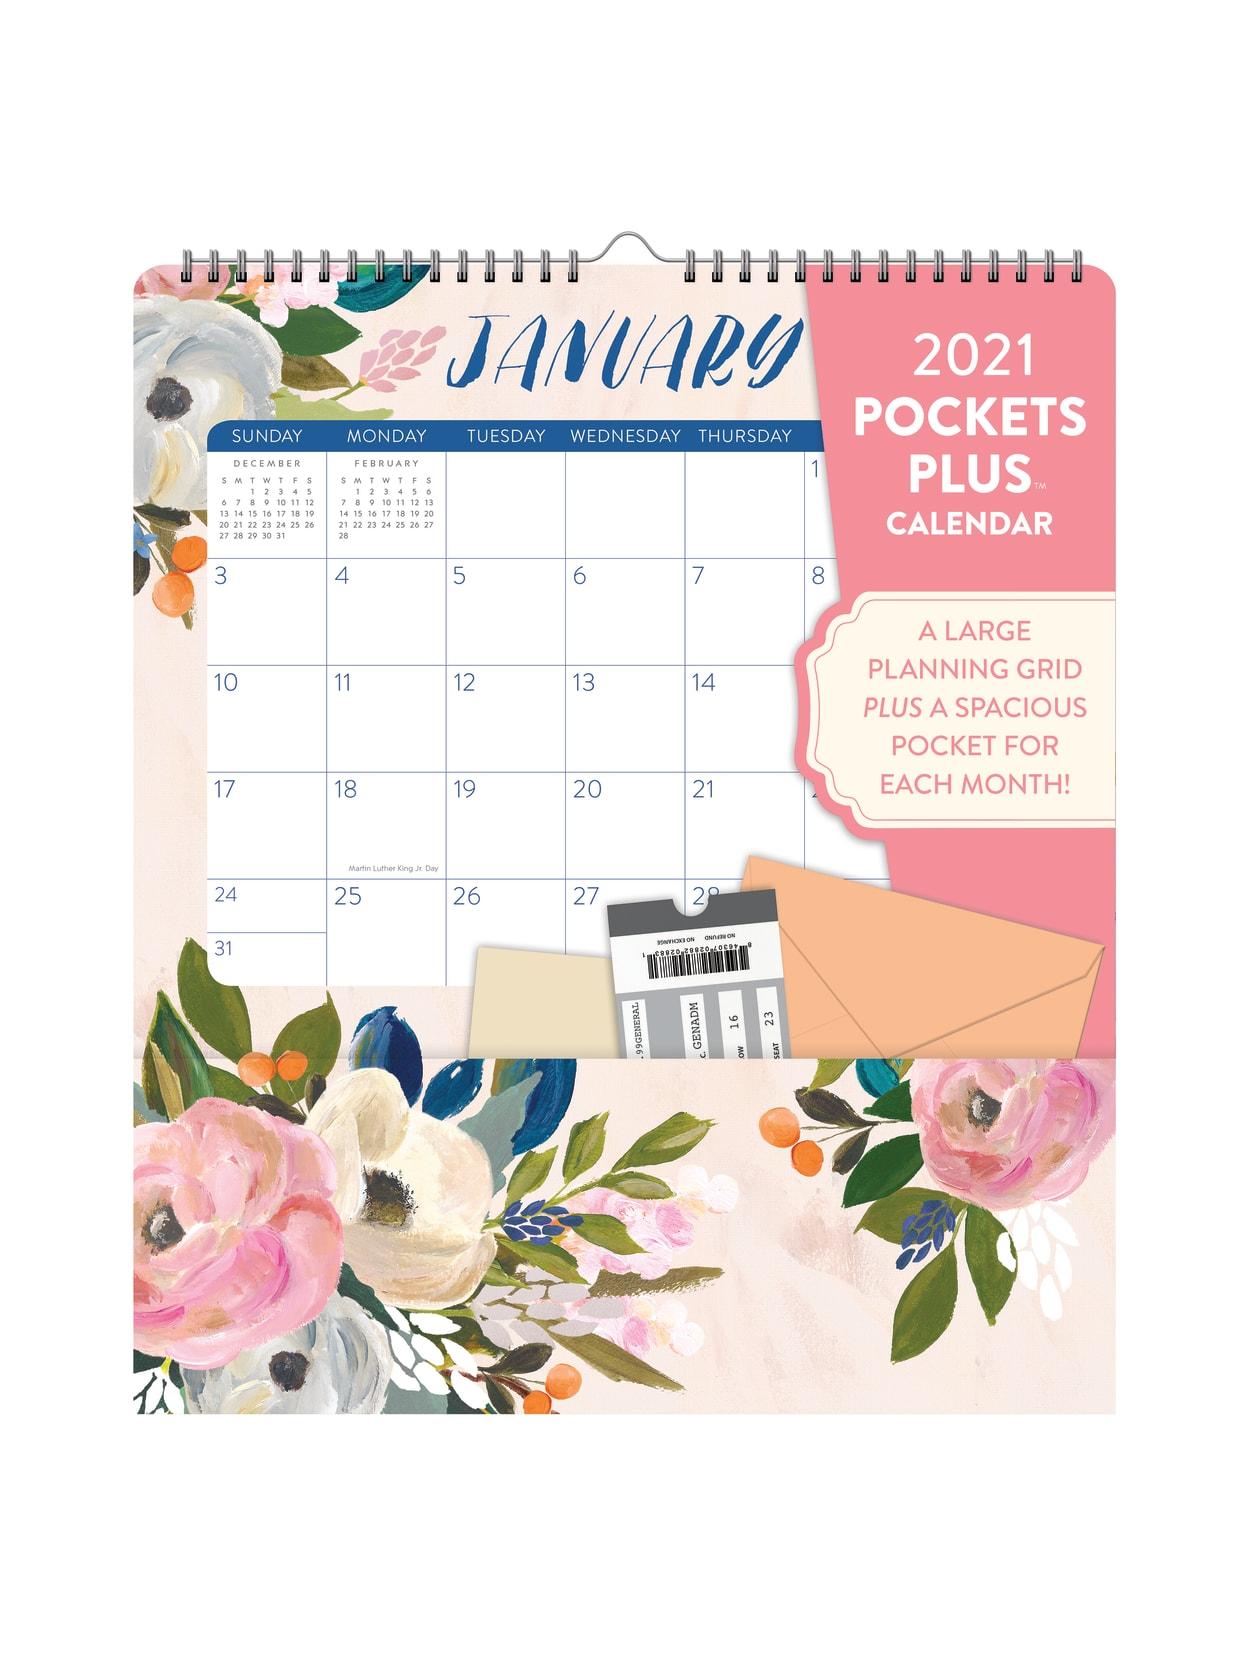 2021 Calendar With Pockets OCS Bella Pockets Plus Calendar 2021   Office Depot